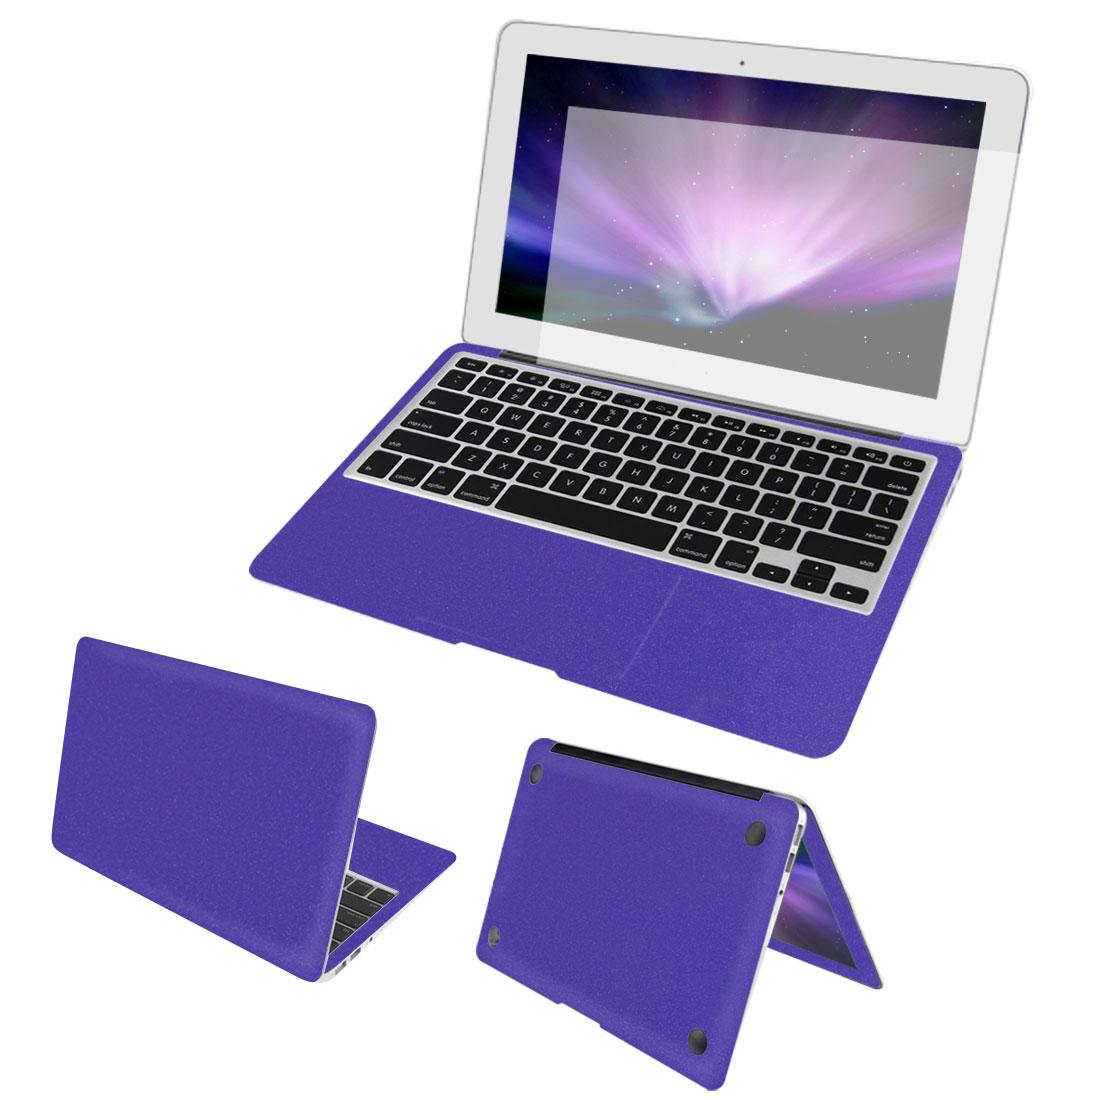 "Purple Full Body Wrap Protector Decal Skin Screen Guard for Apple Macbook Pro 15"""